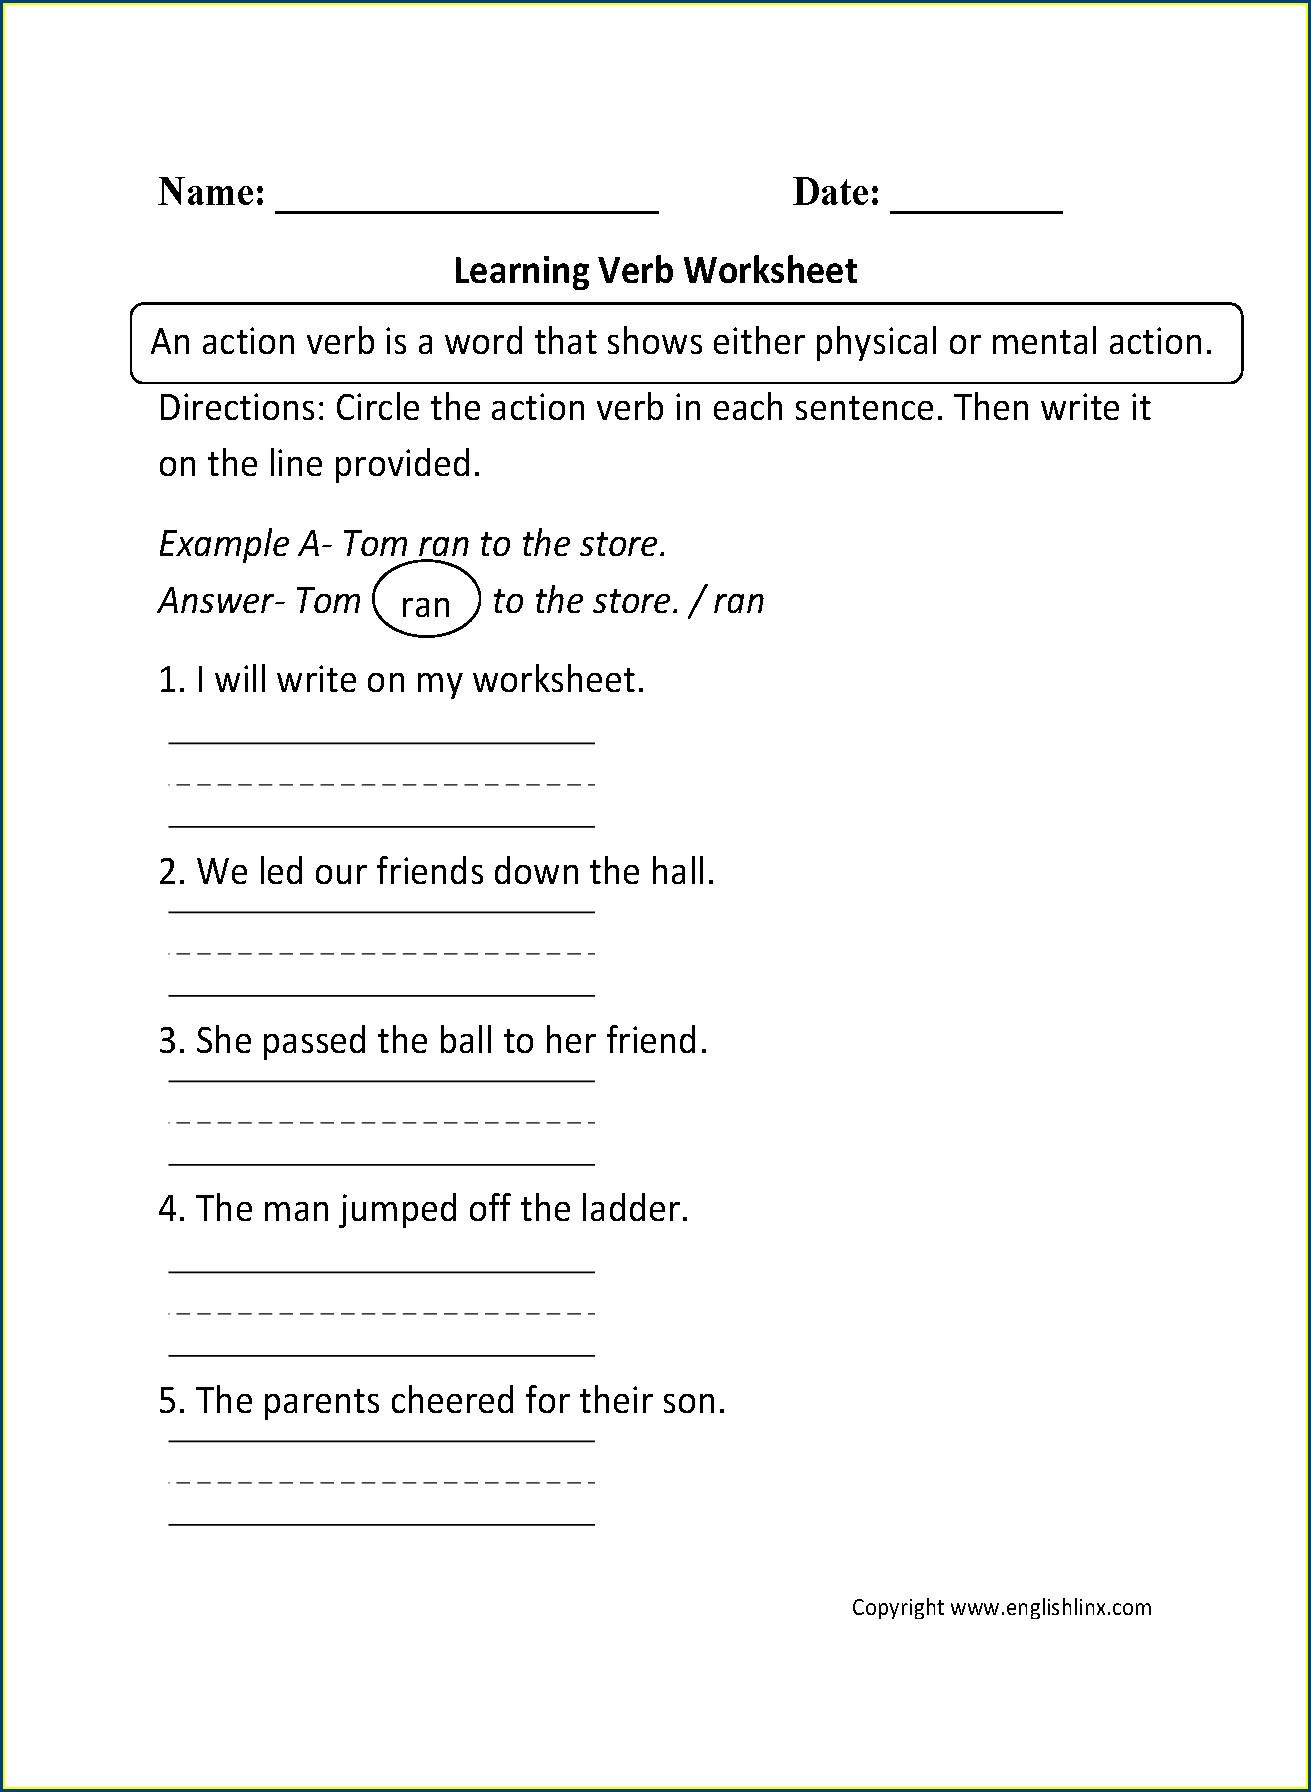 Subject Verb Agreement Worksheet Part 1 Answers Worksheet